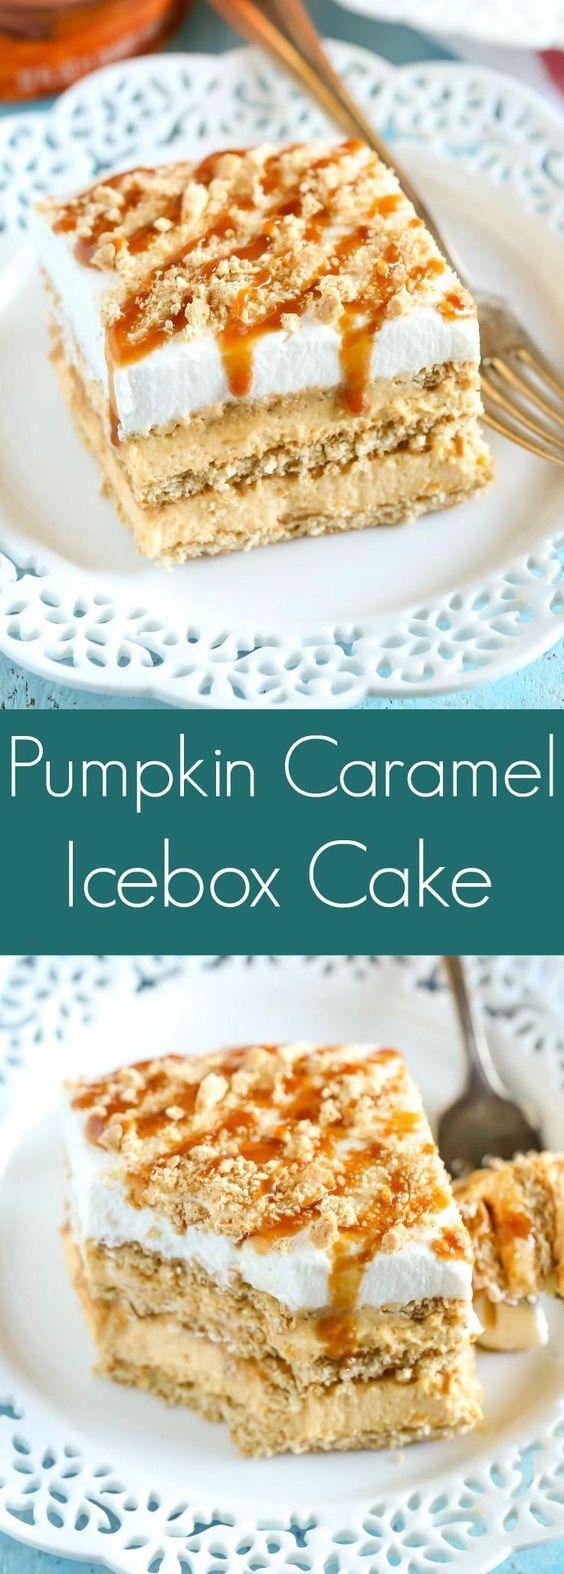 explore ice box cakes icecream cakes and more